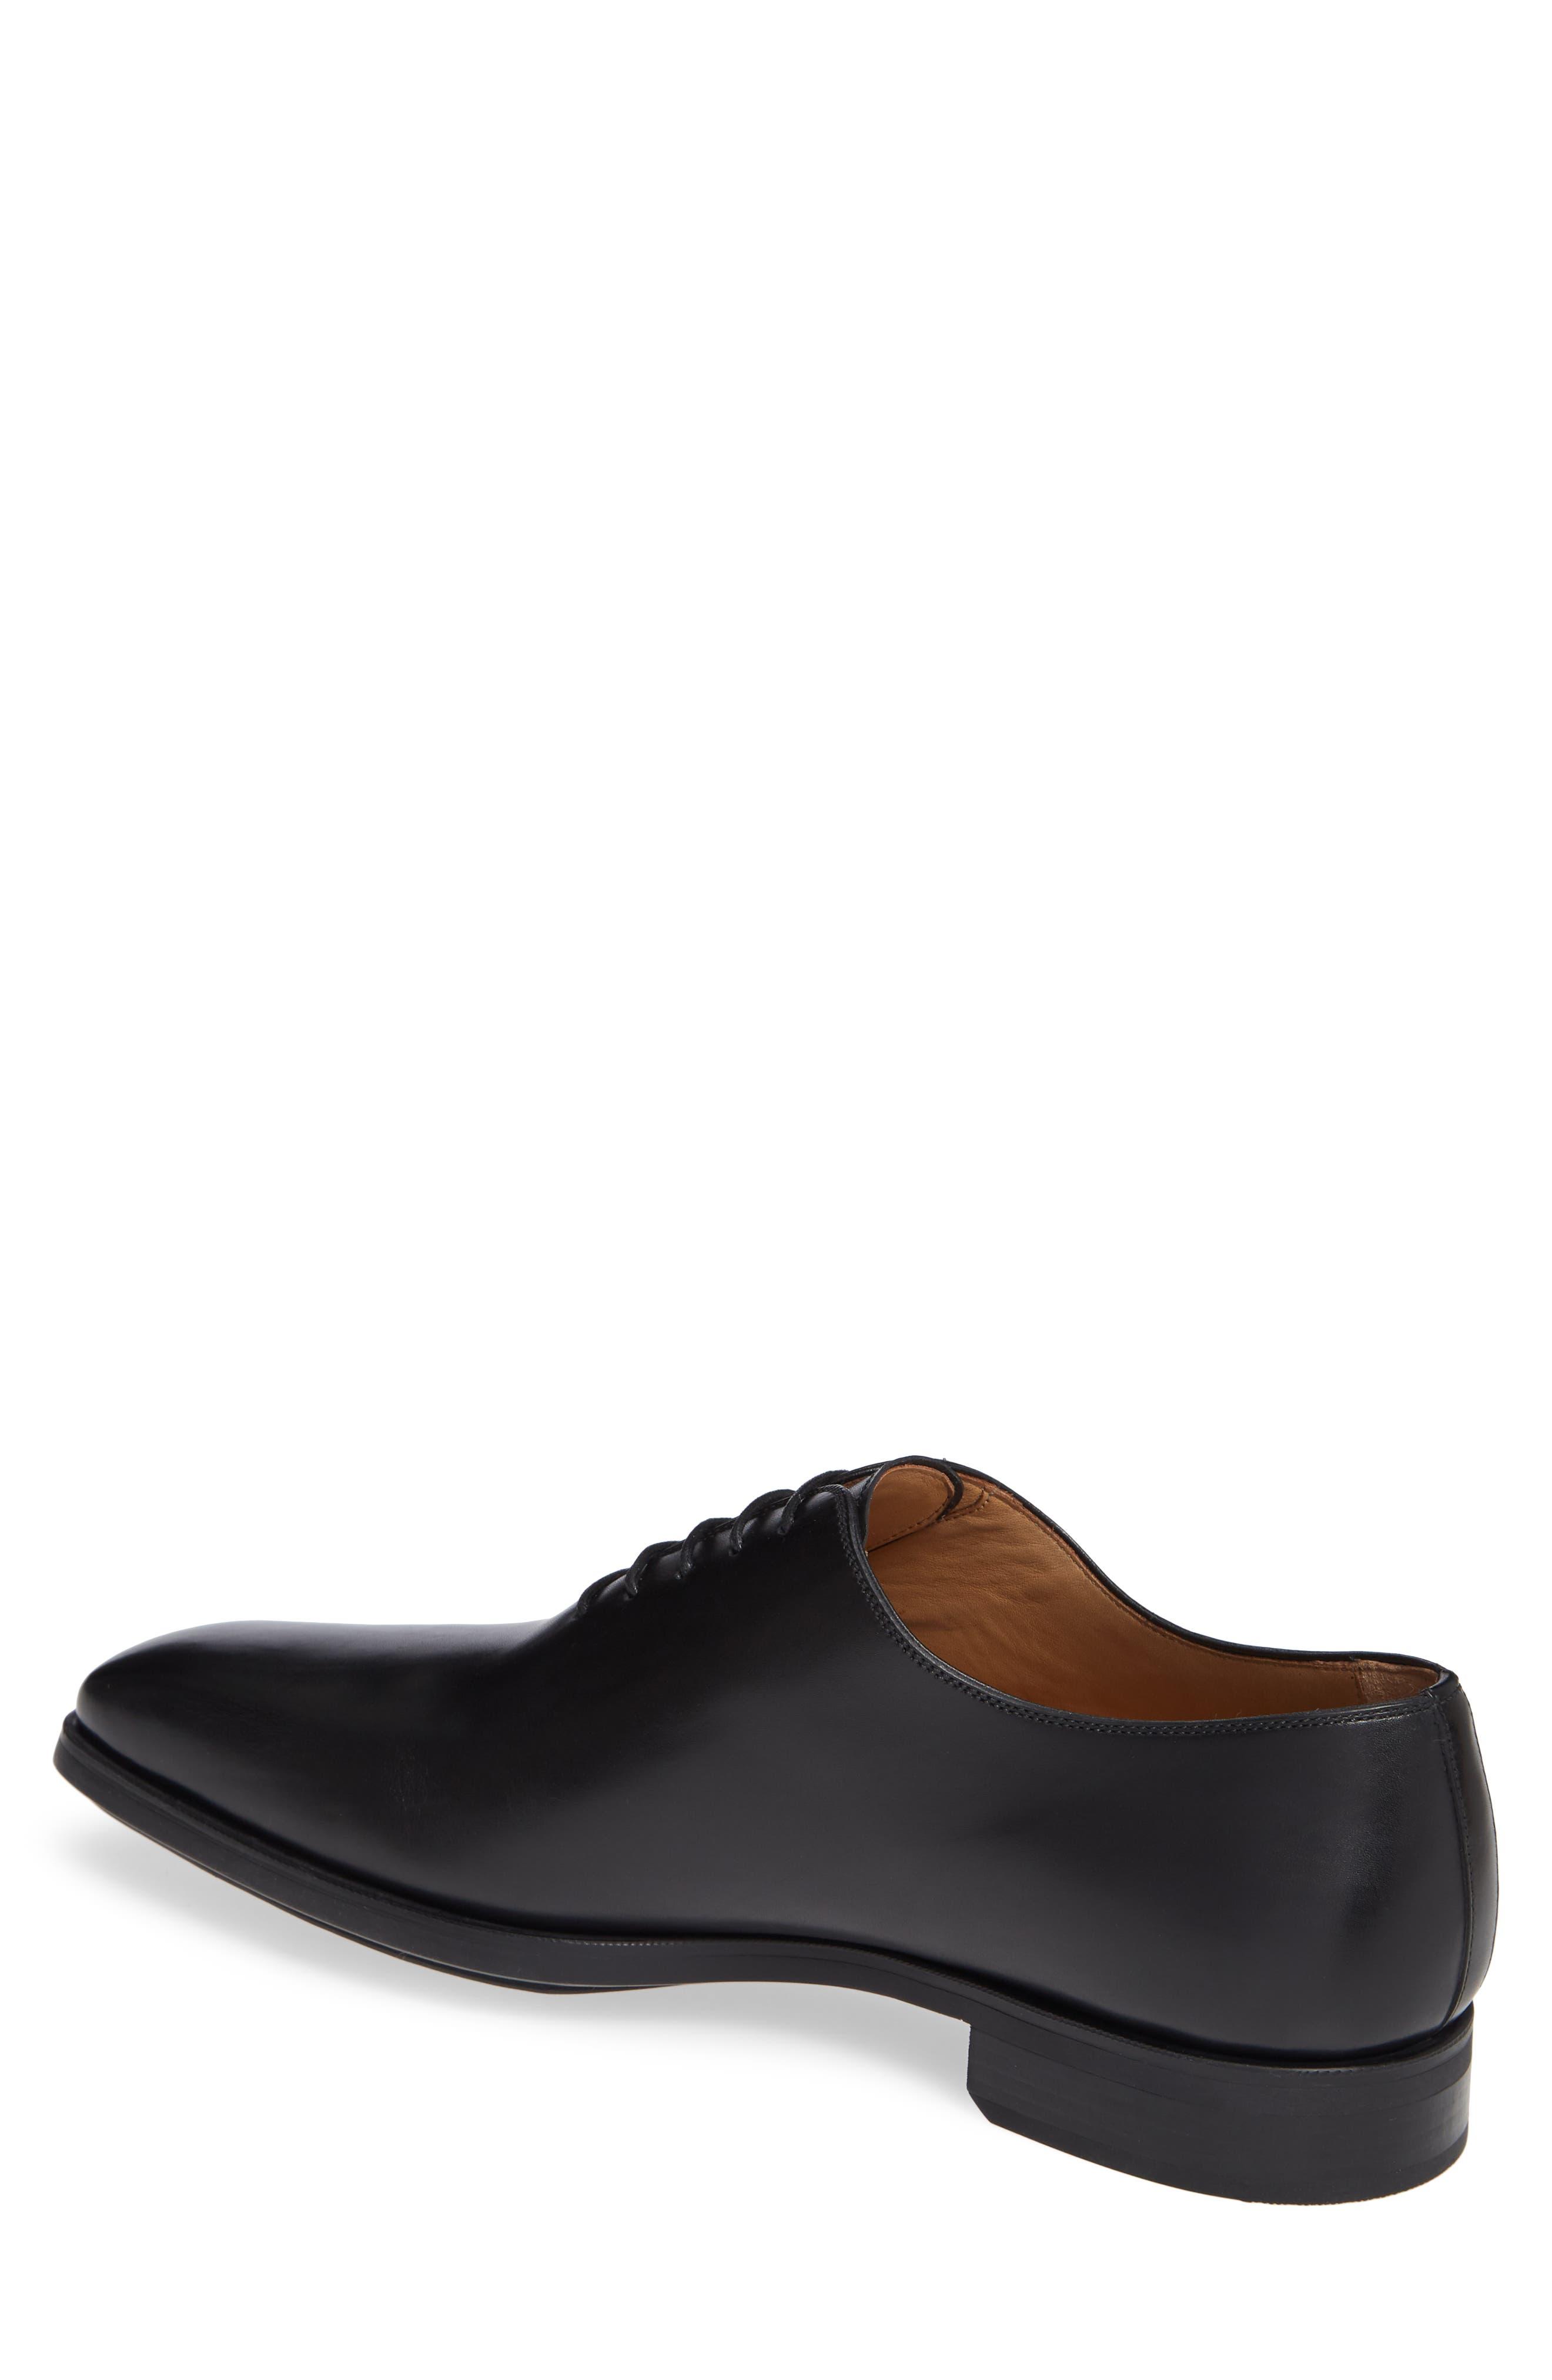 Ryder Plain Toe Oxford,                             Alternate thumbnail 2, color,                             BLACK LEATHER